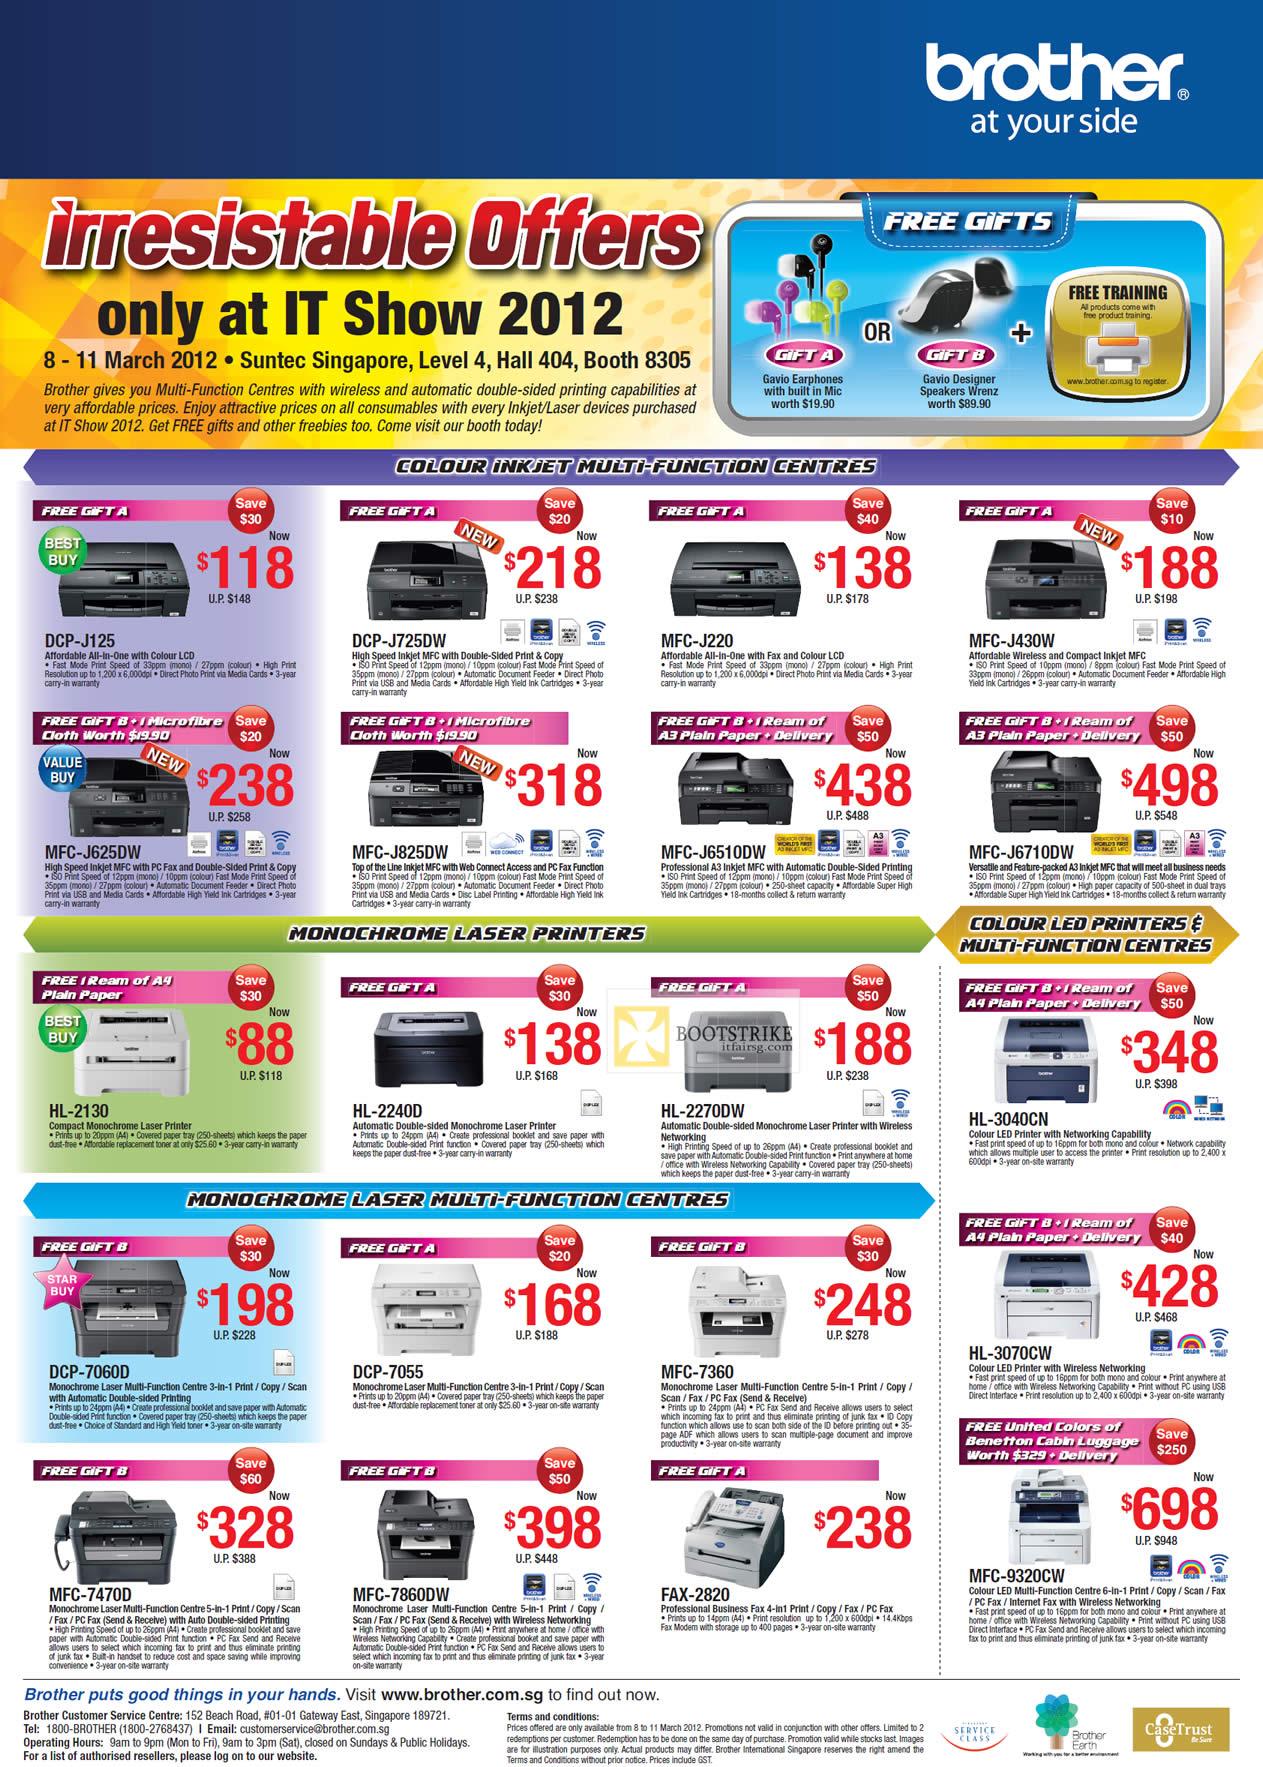 IT SHOW 2012 price list image brochure of Brother Printers Inkjet DCP-J125, J725DW, MFC-J220 J430 J625DW J6710DW, Laser HL-2130 2240D 2270DW 3040CN 9320CW, 7060D 7055 7360 7470D 7860DW